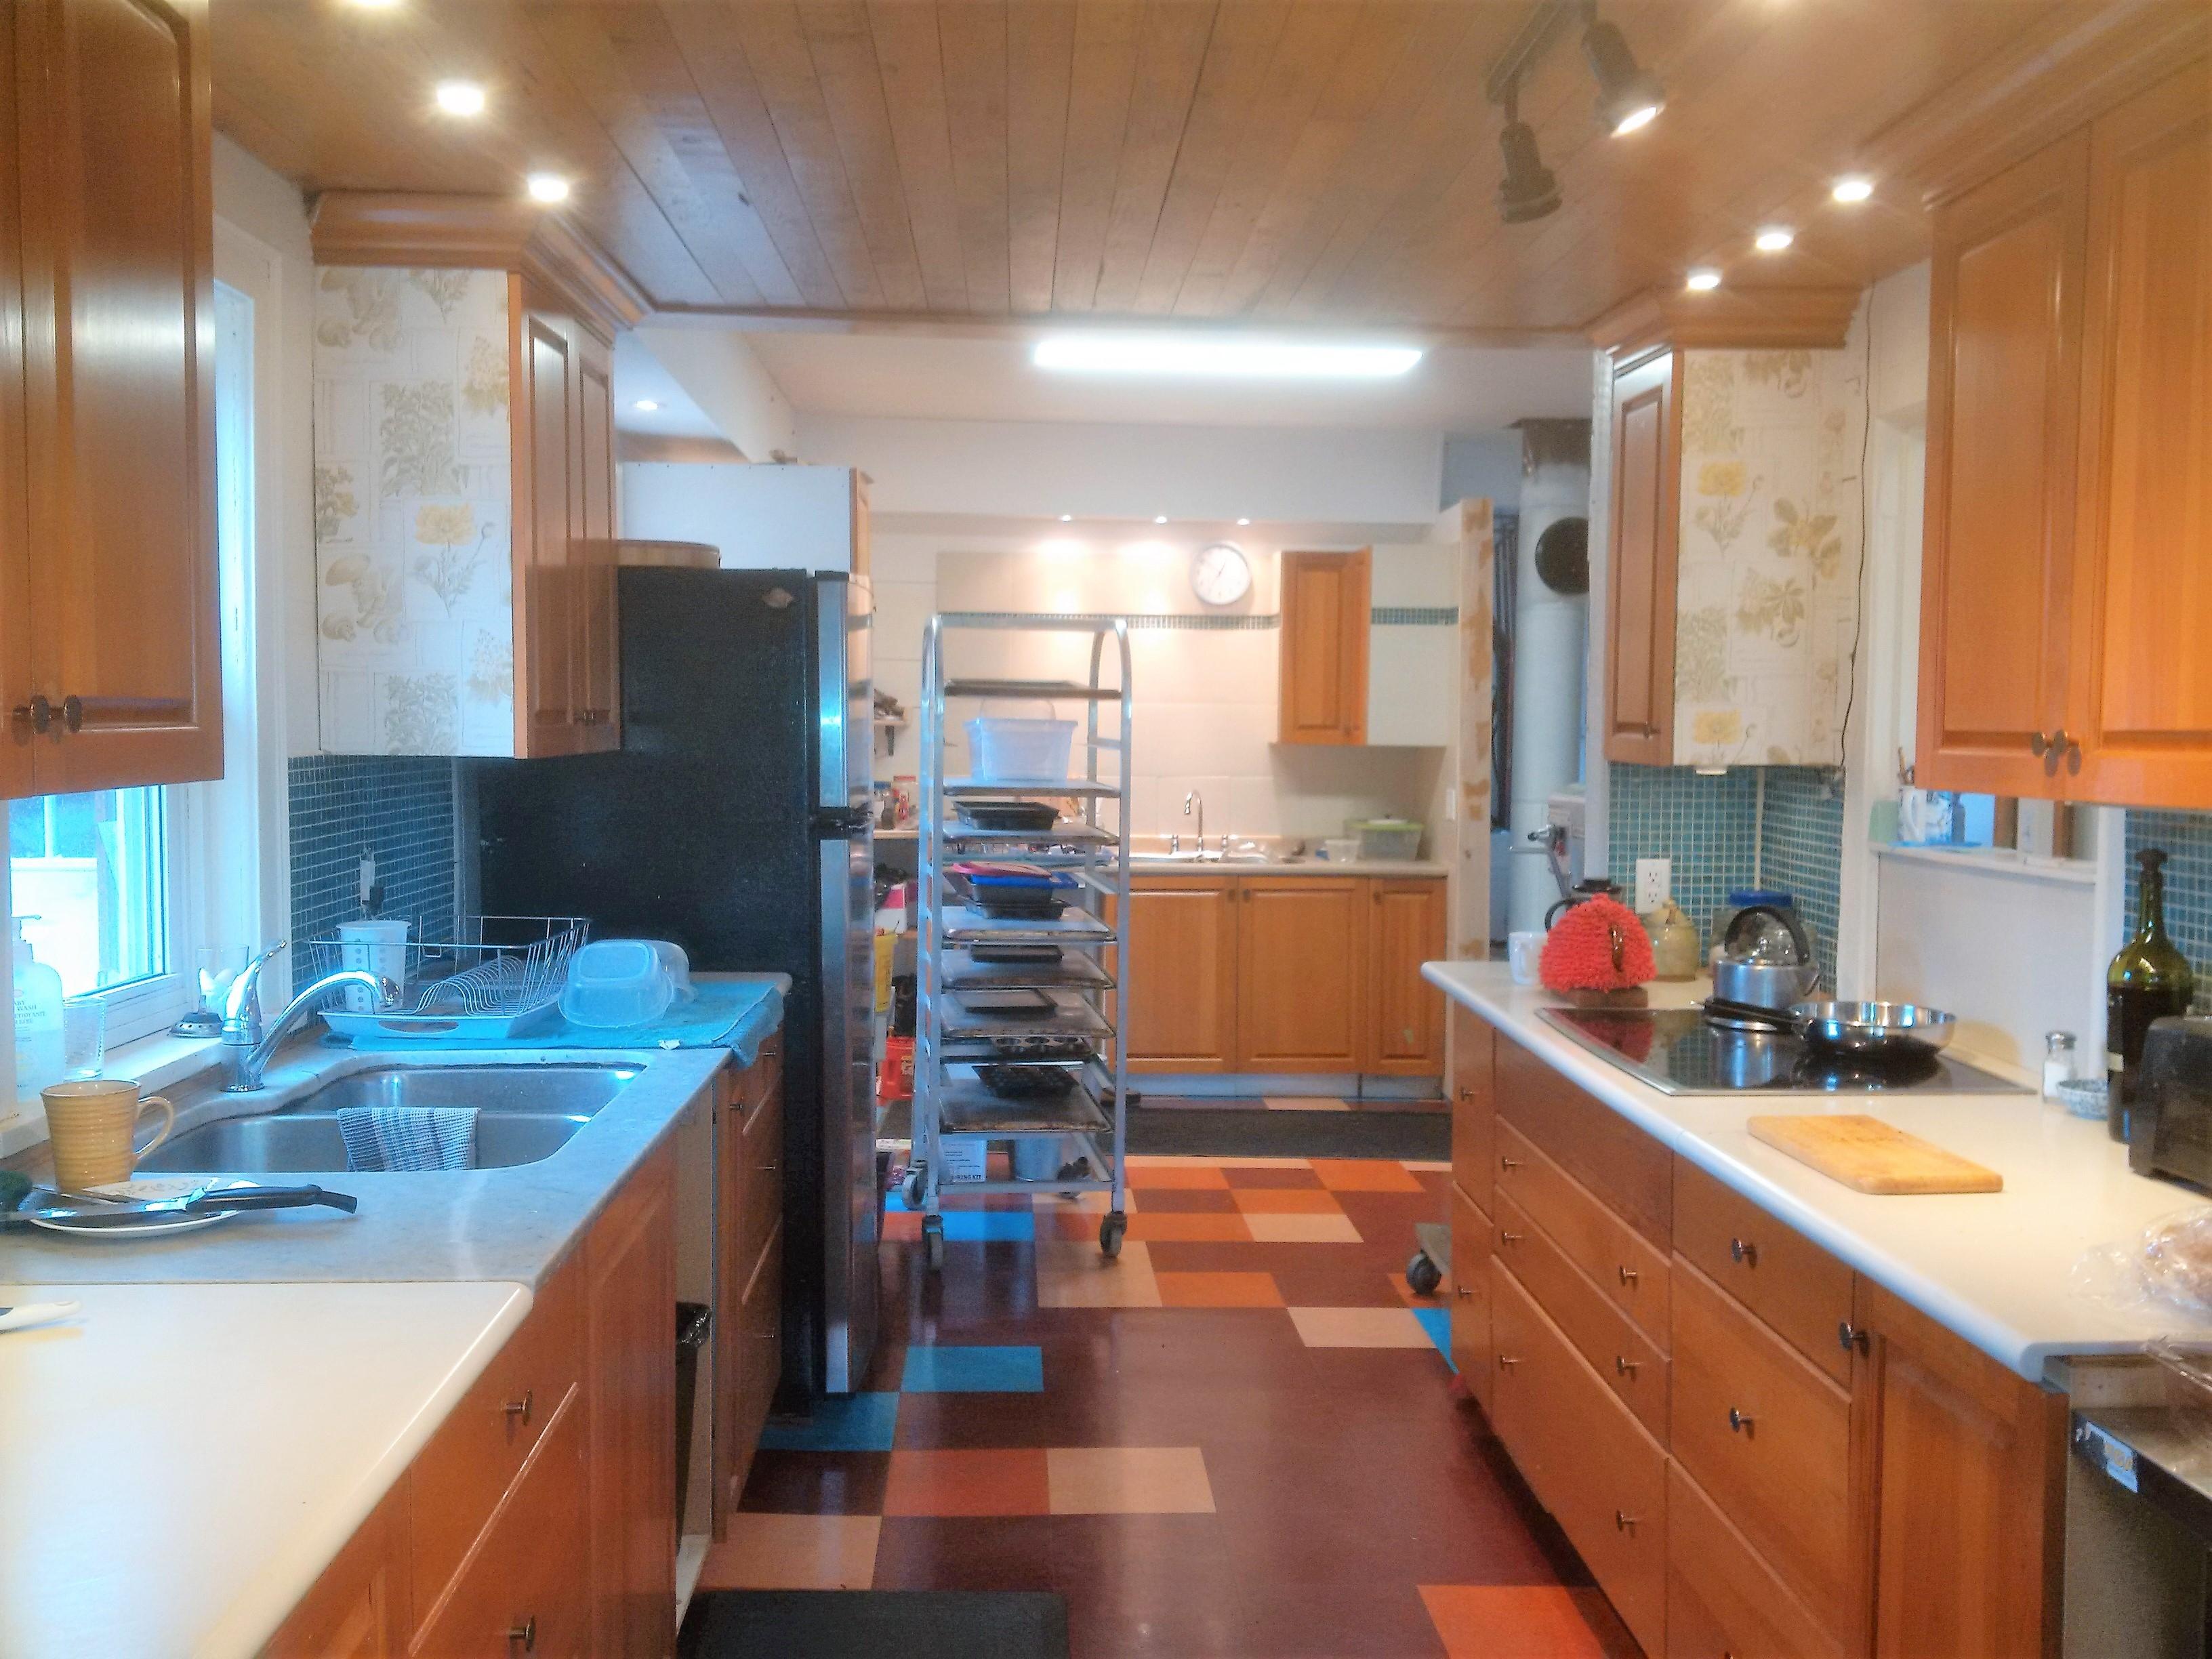 Baker's Kitchen